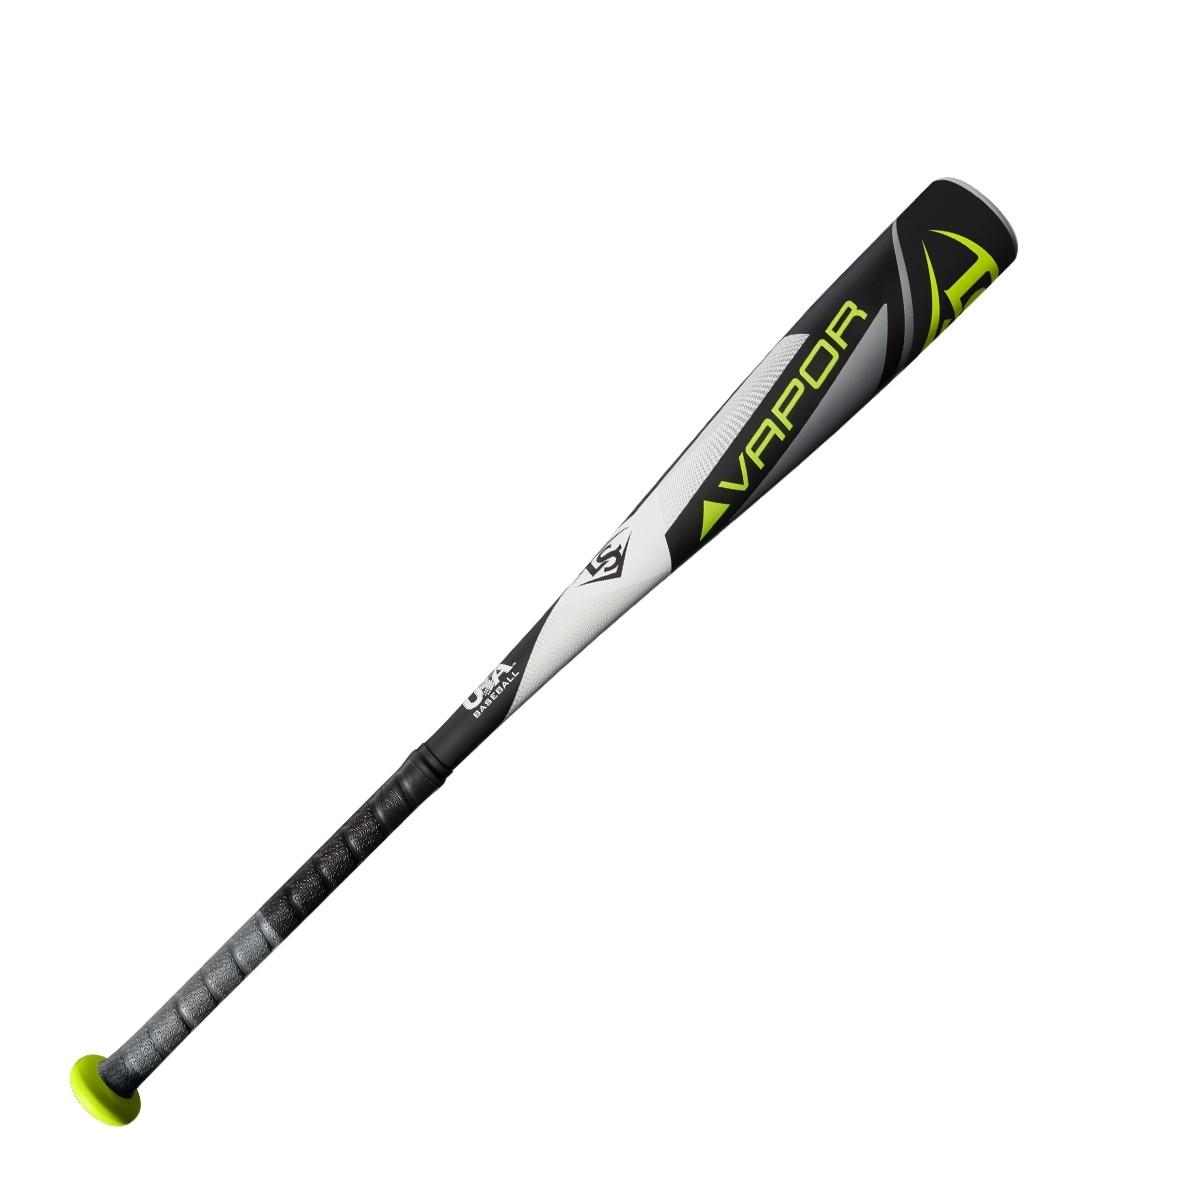 Louisville Slugger 2018 Vapor USA Baseball Bat (-9)